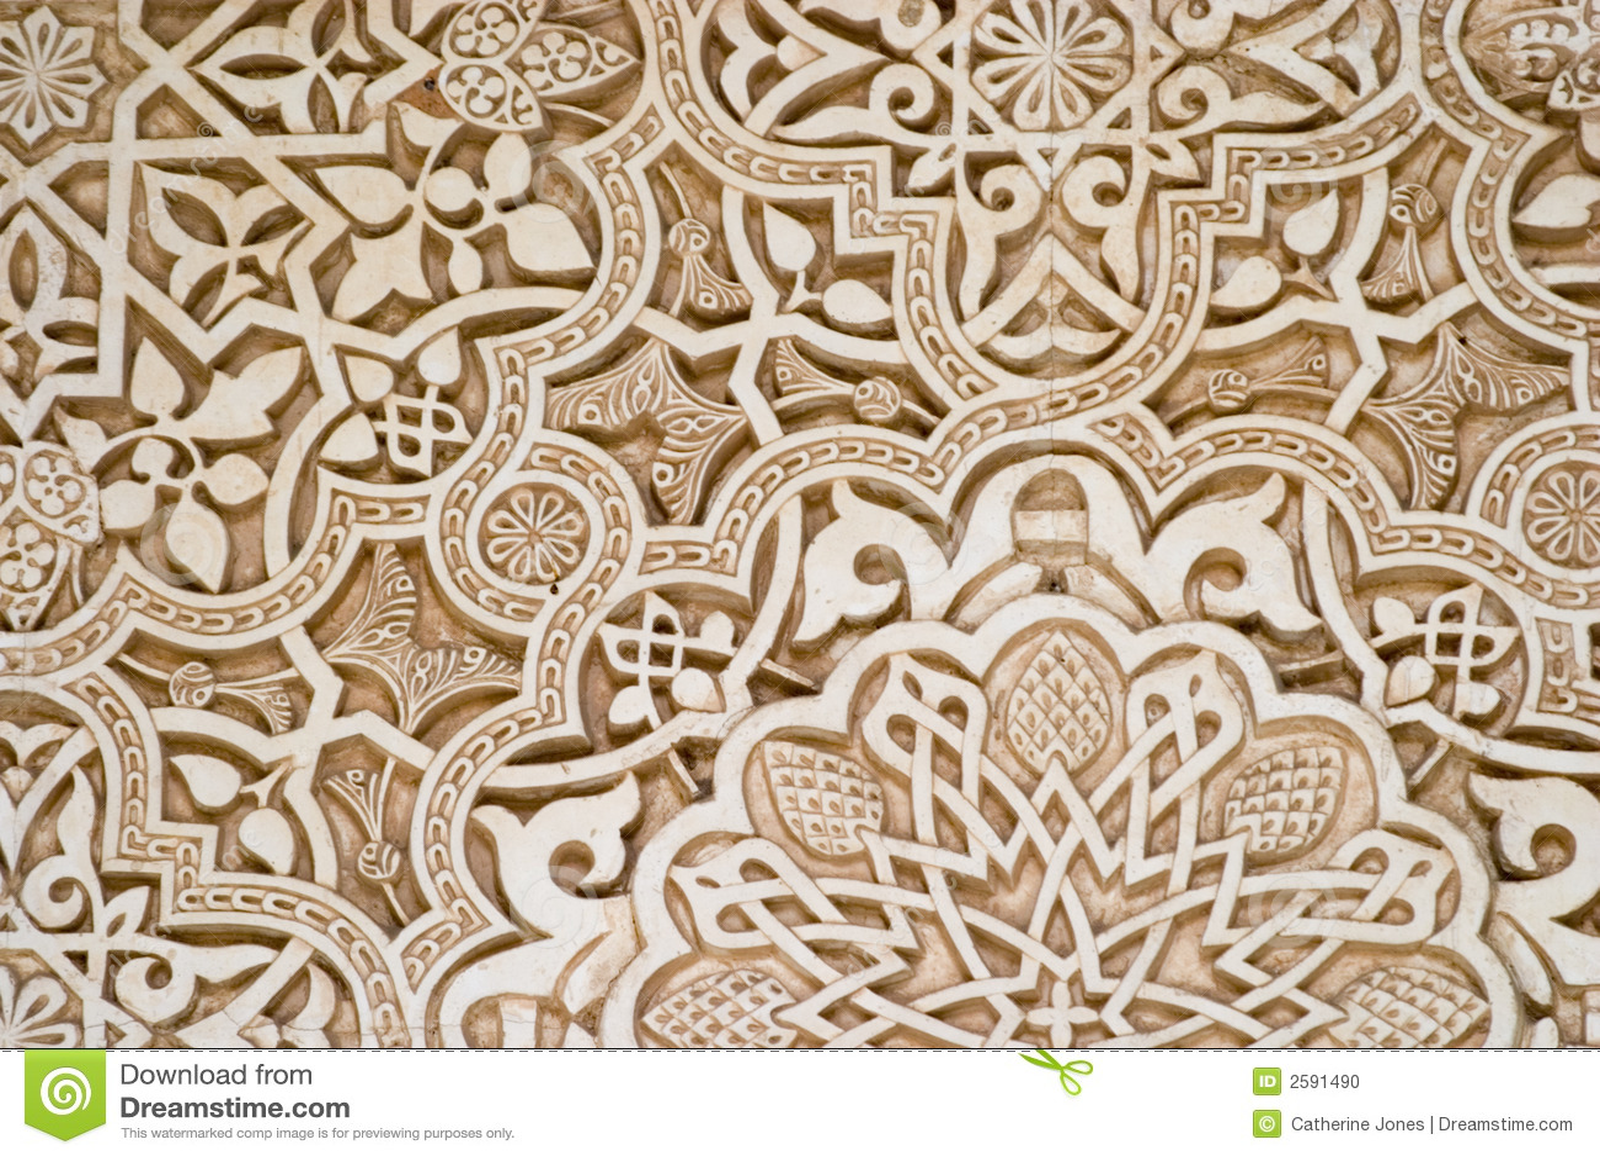 Sztuka islamska alhambra